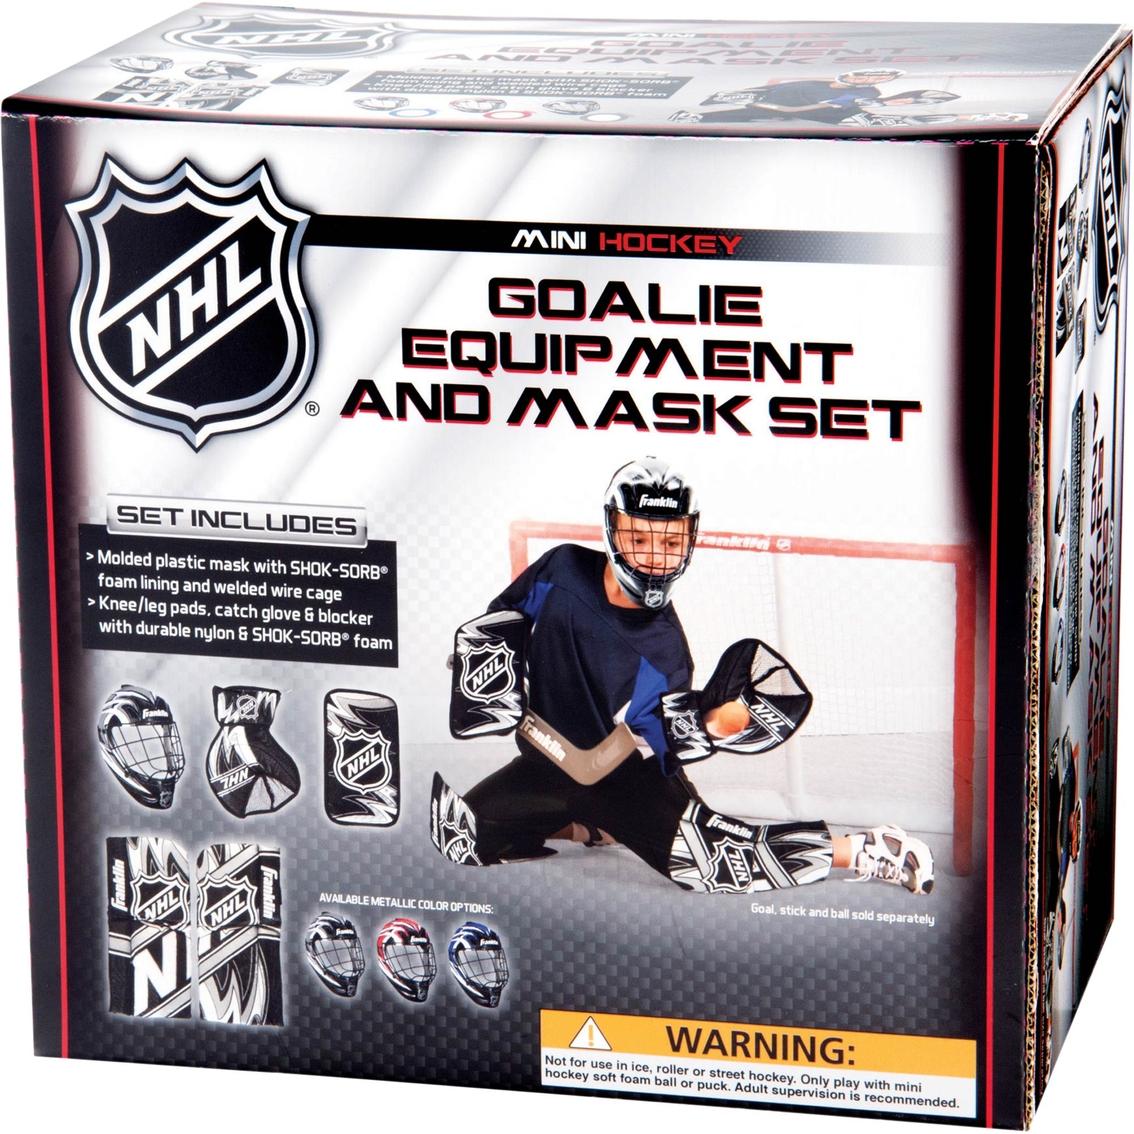 Franklin Sports Nhl Mini Hockey Goalie Equipment And Mask Set